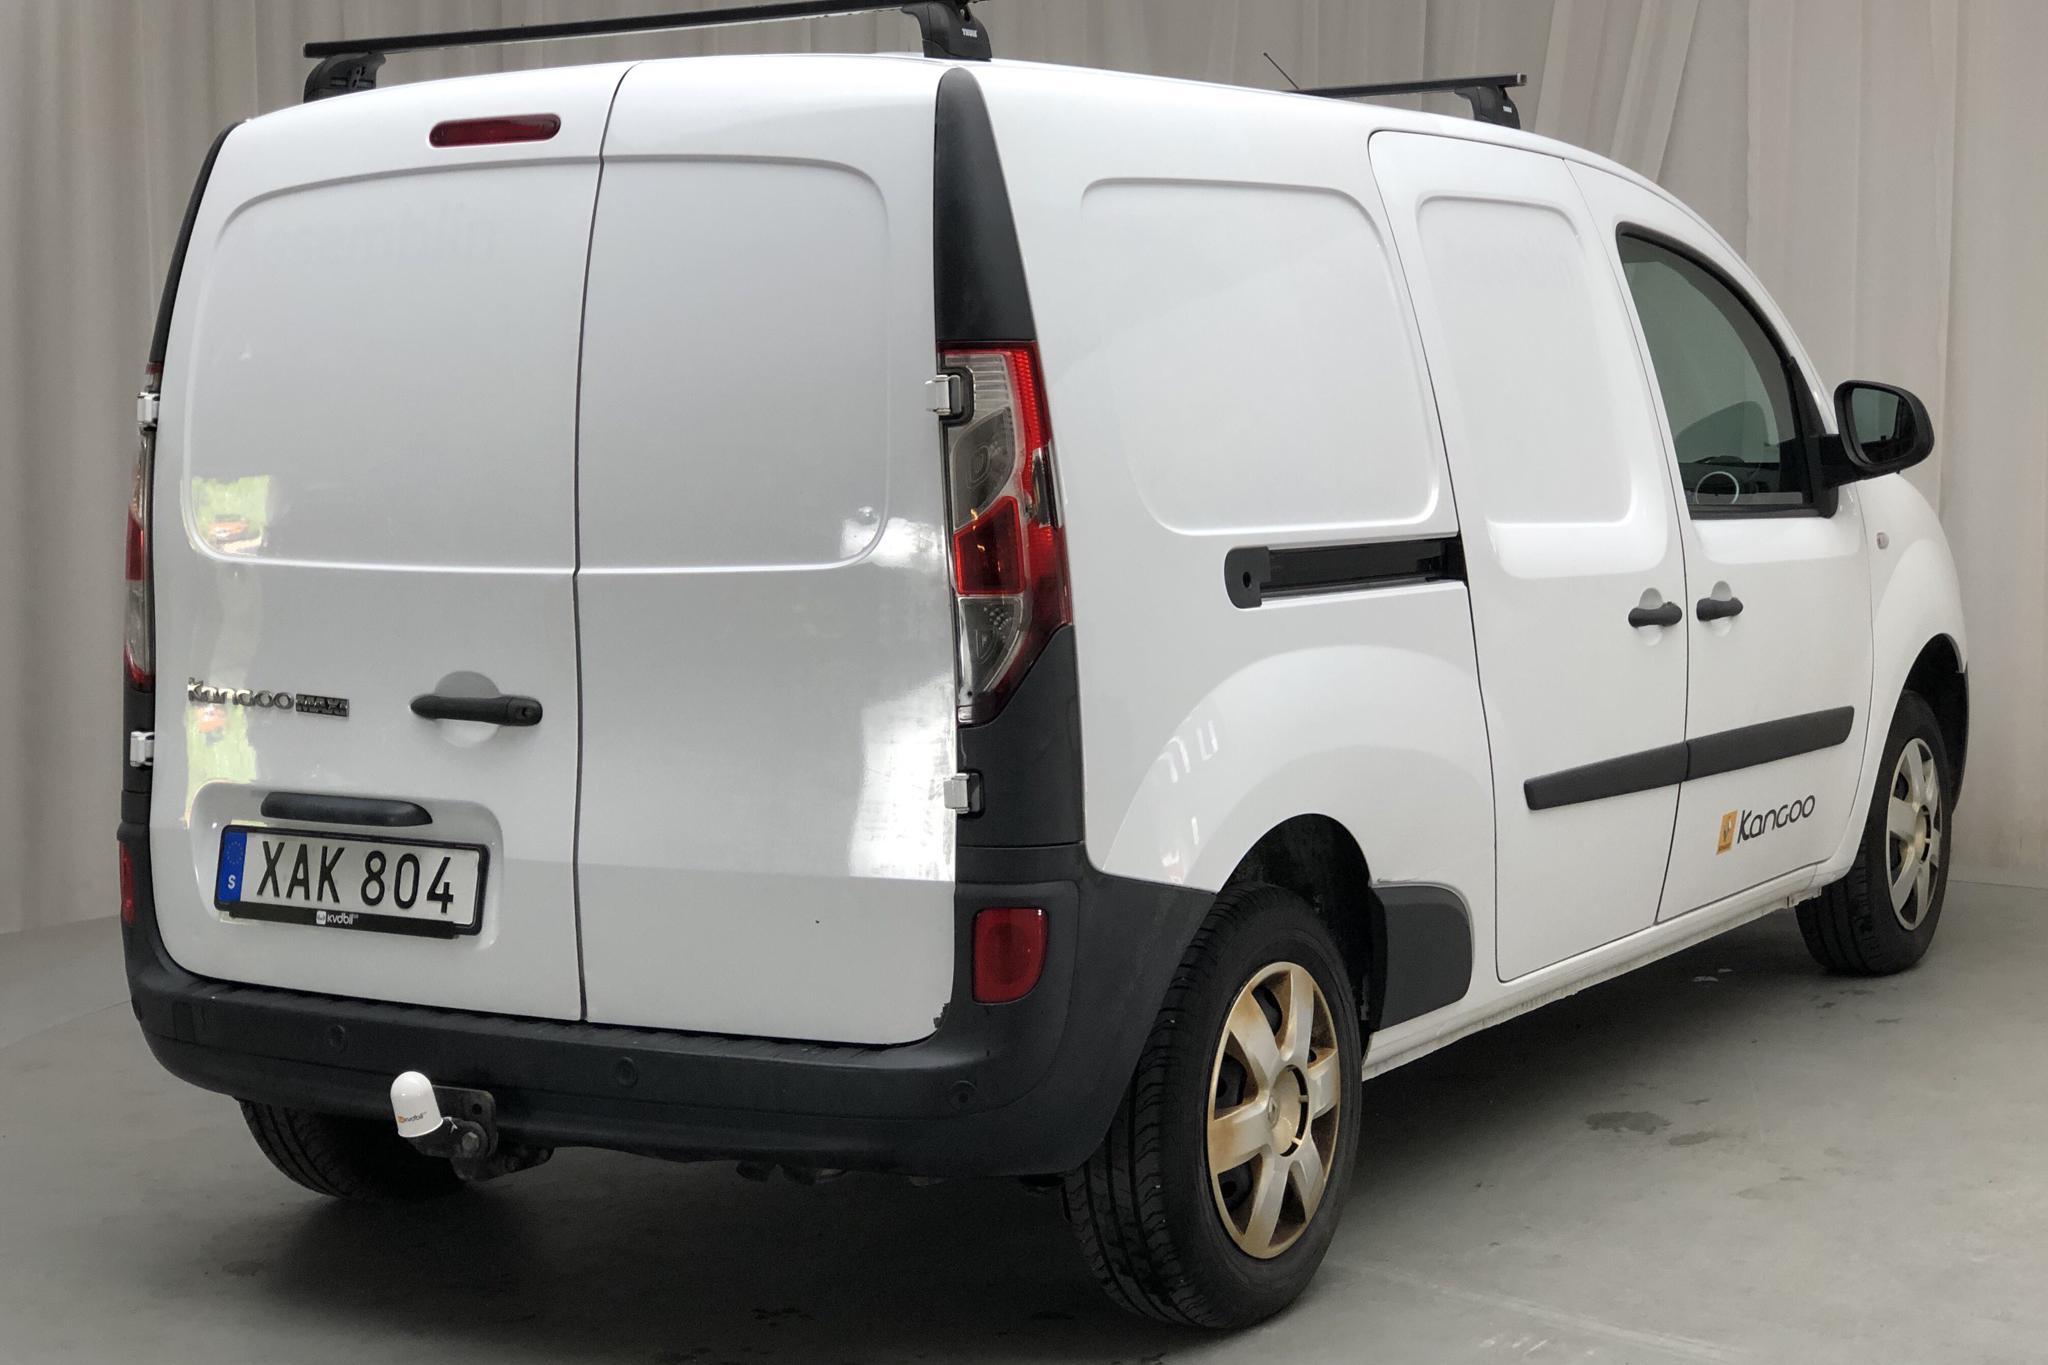 Renault Kangoo 1.5 dCi Maxi Skåp (110hk) - 83 680 km - Manual - white - 2015